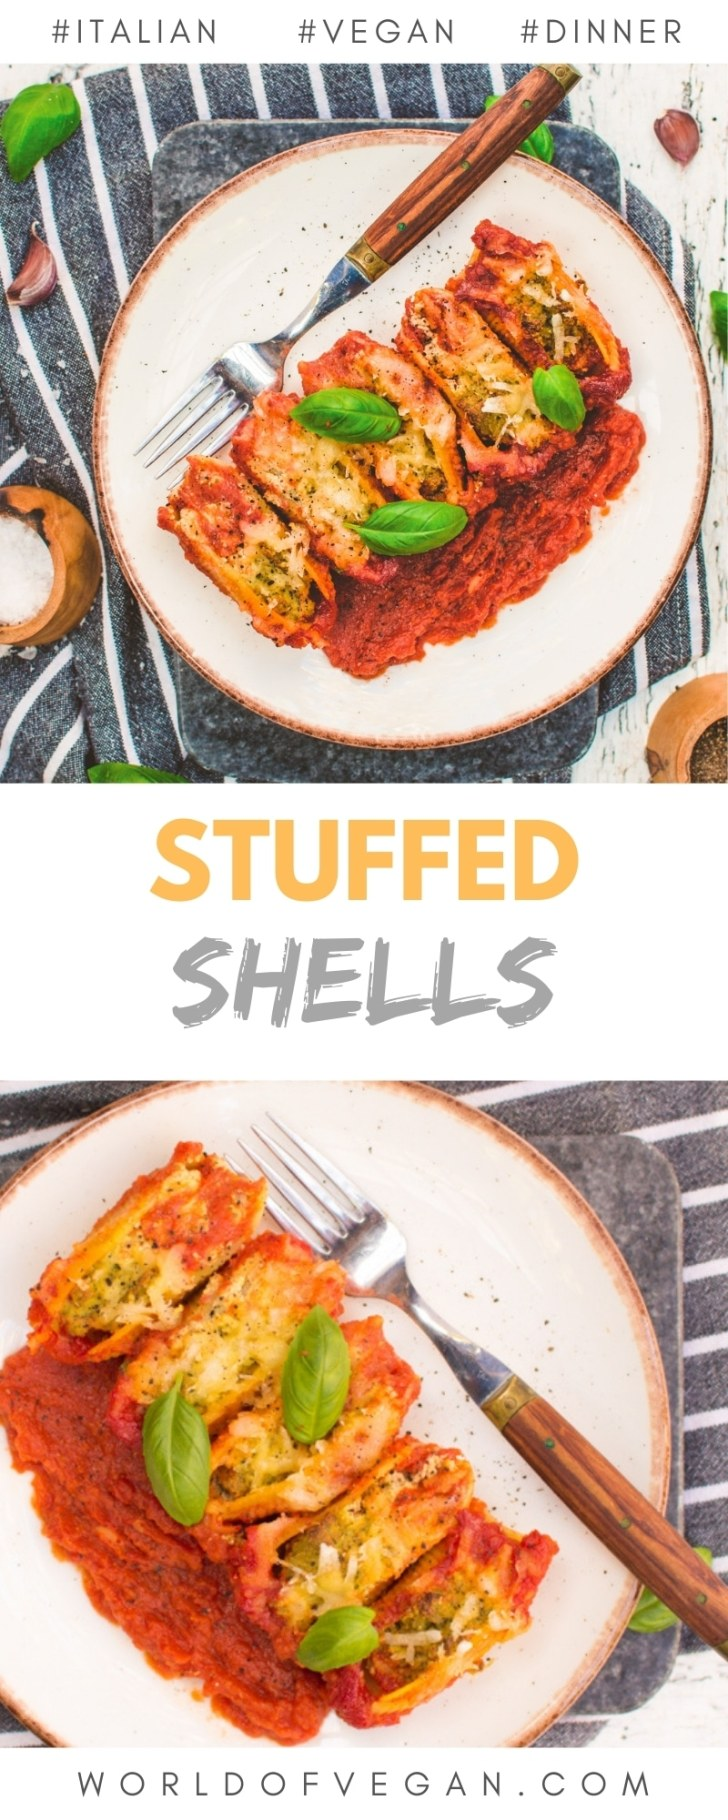 Vegan Stuffed Shells With Tofu Ricotta from The Friendly Vegan